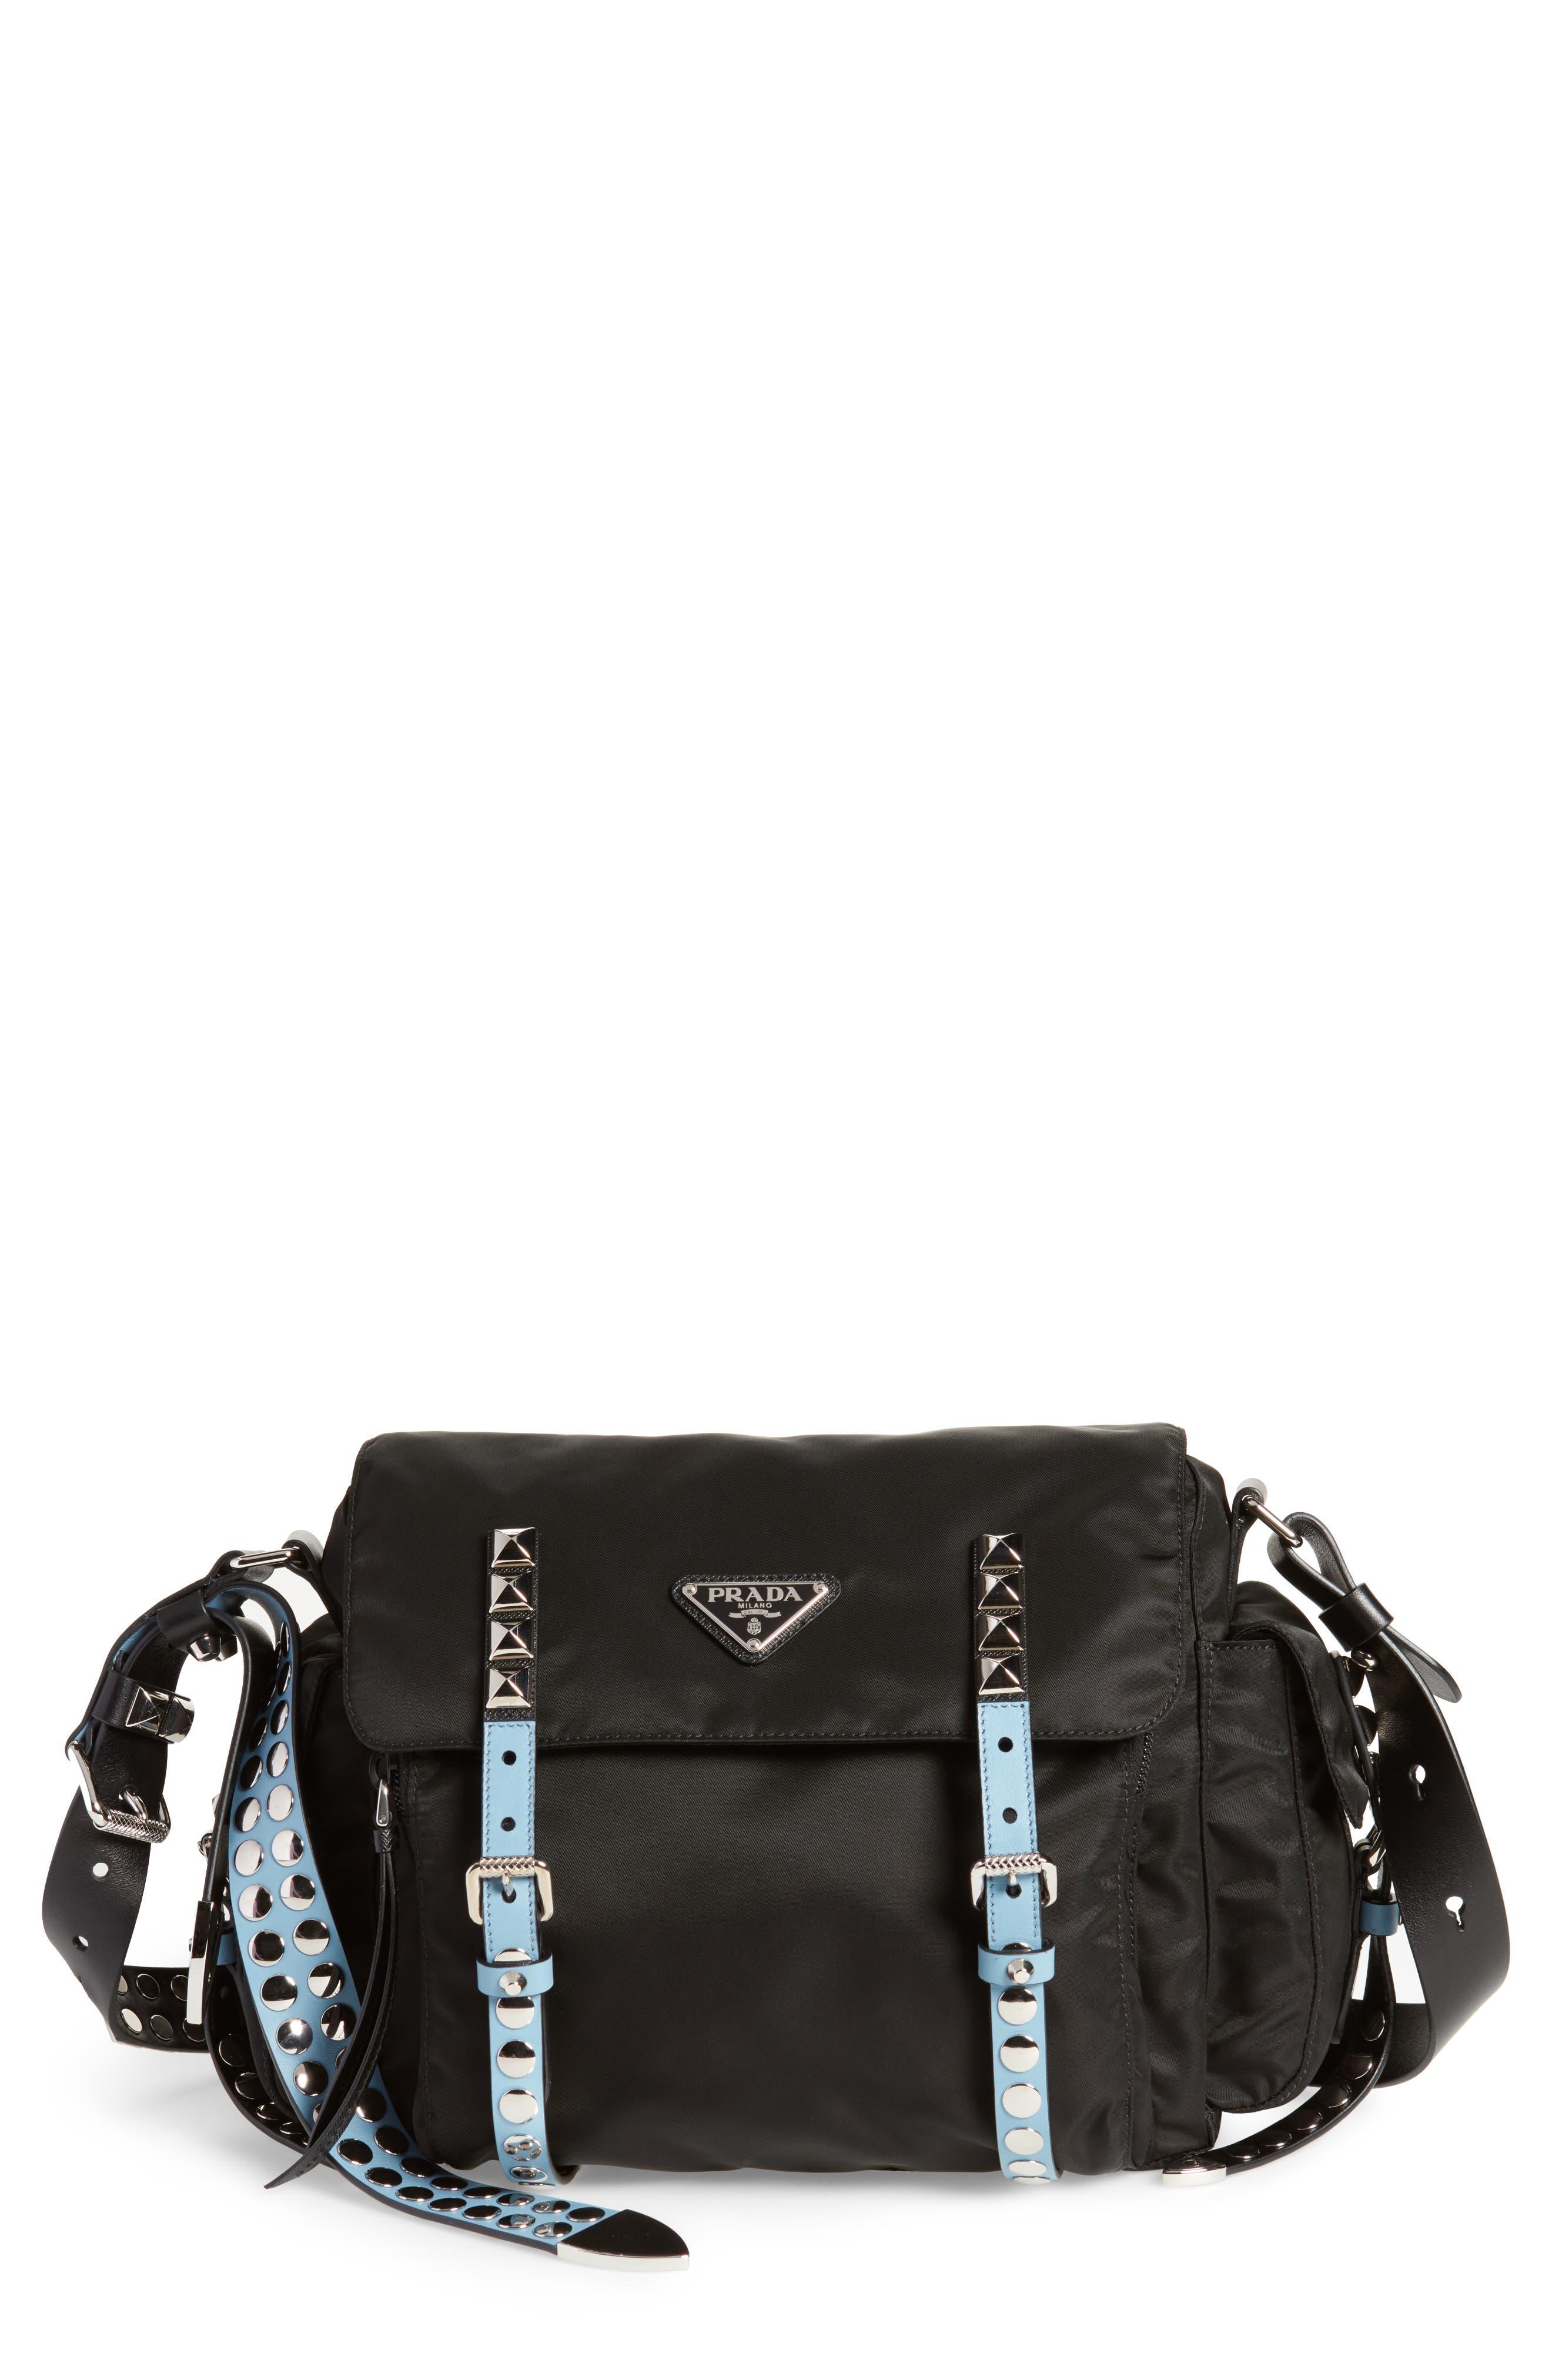 Prada Studded Nylon Messenger Bag